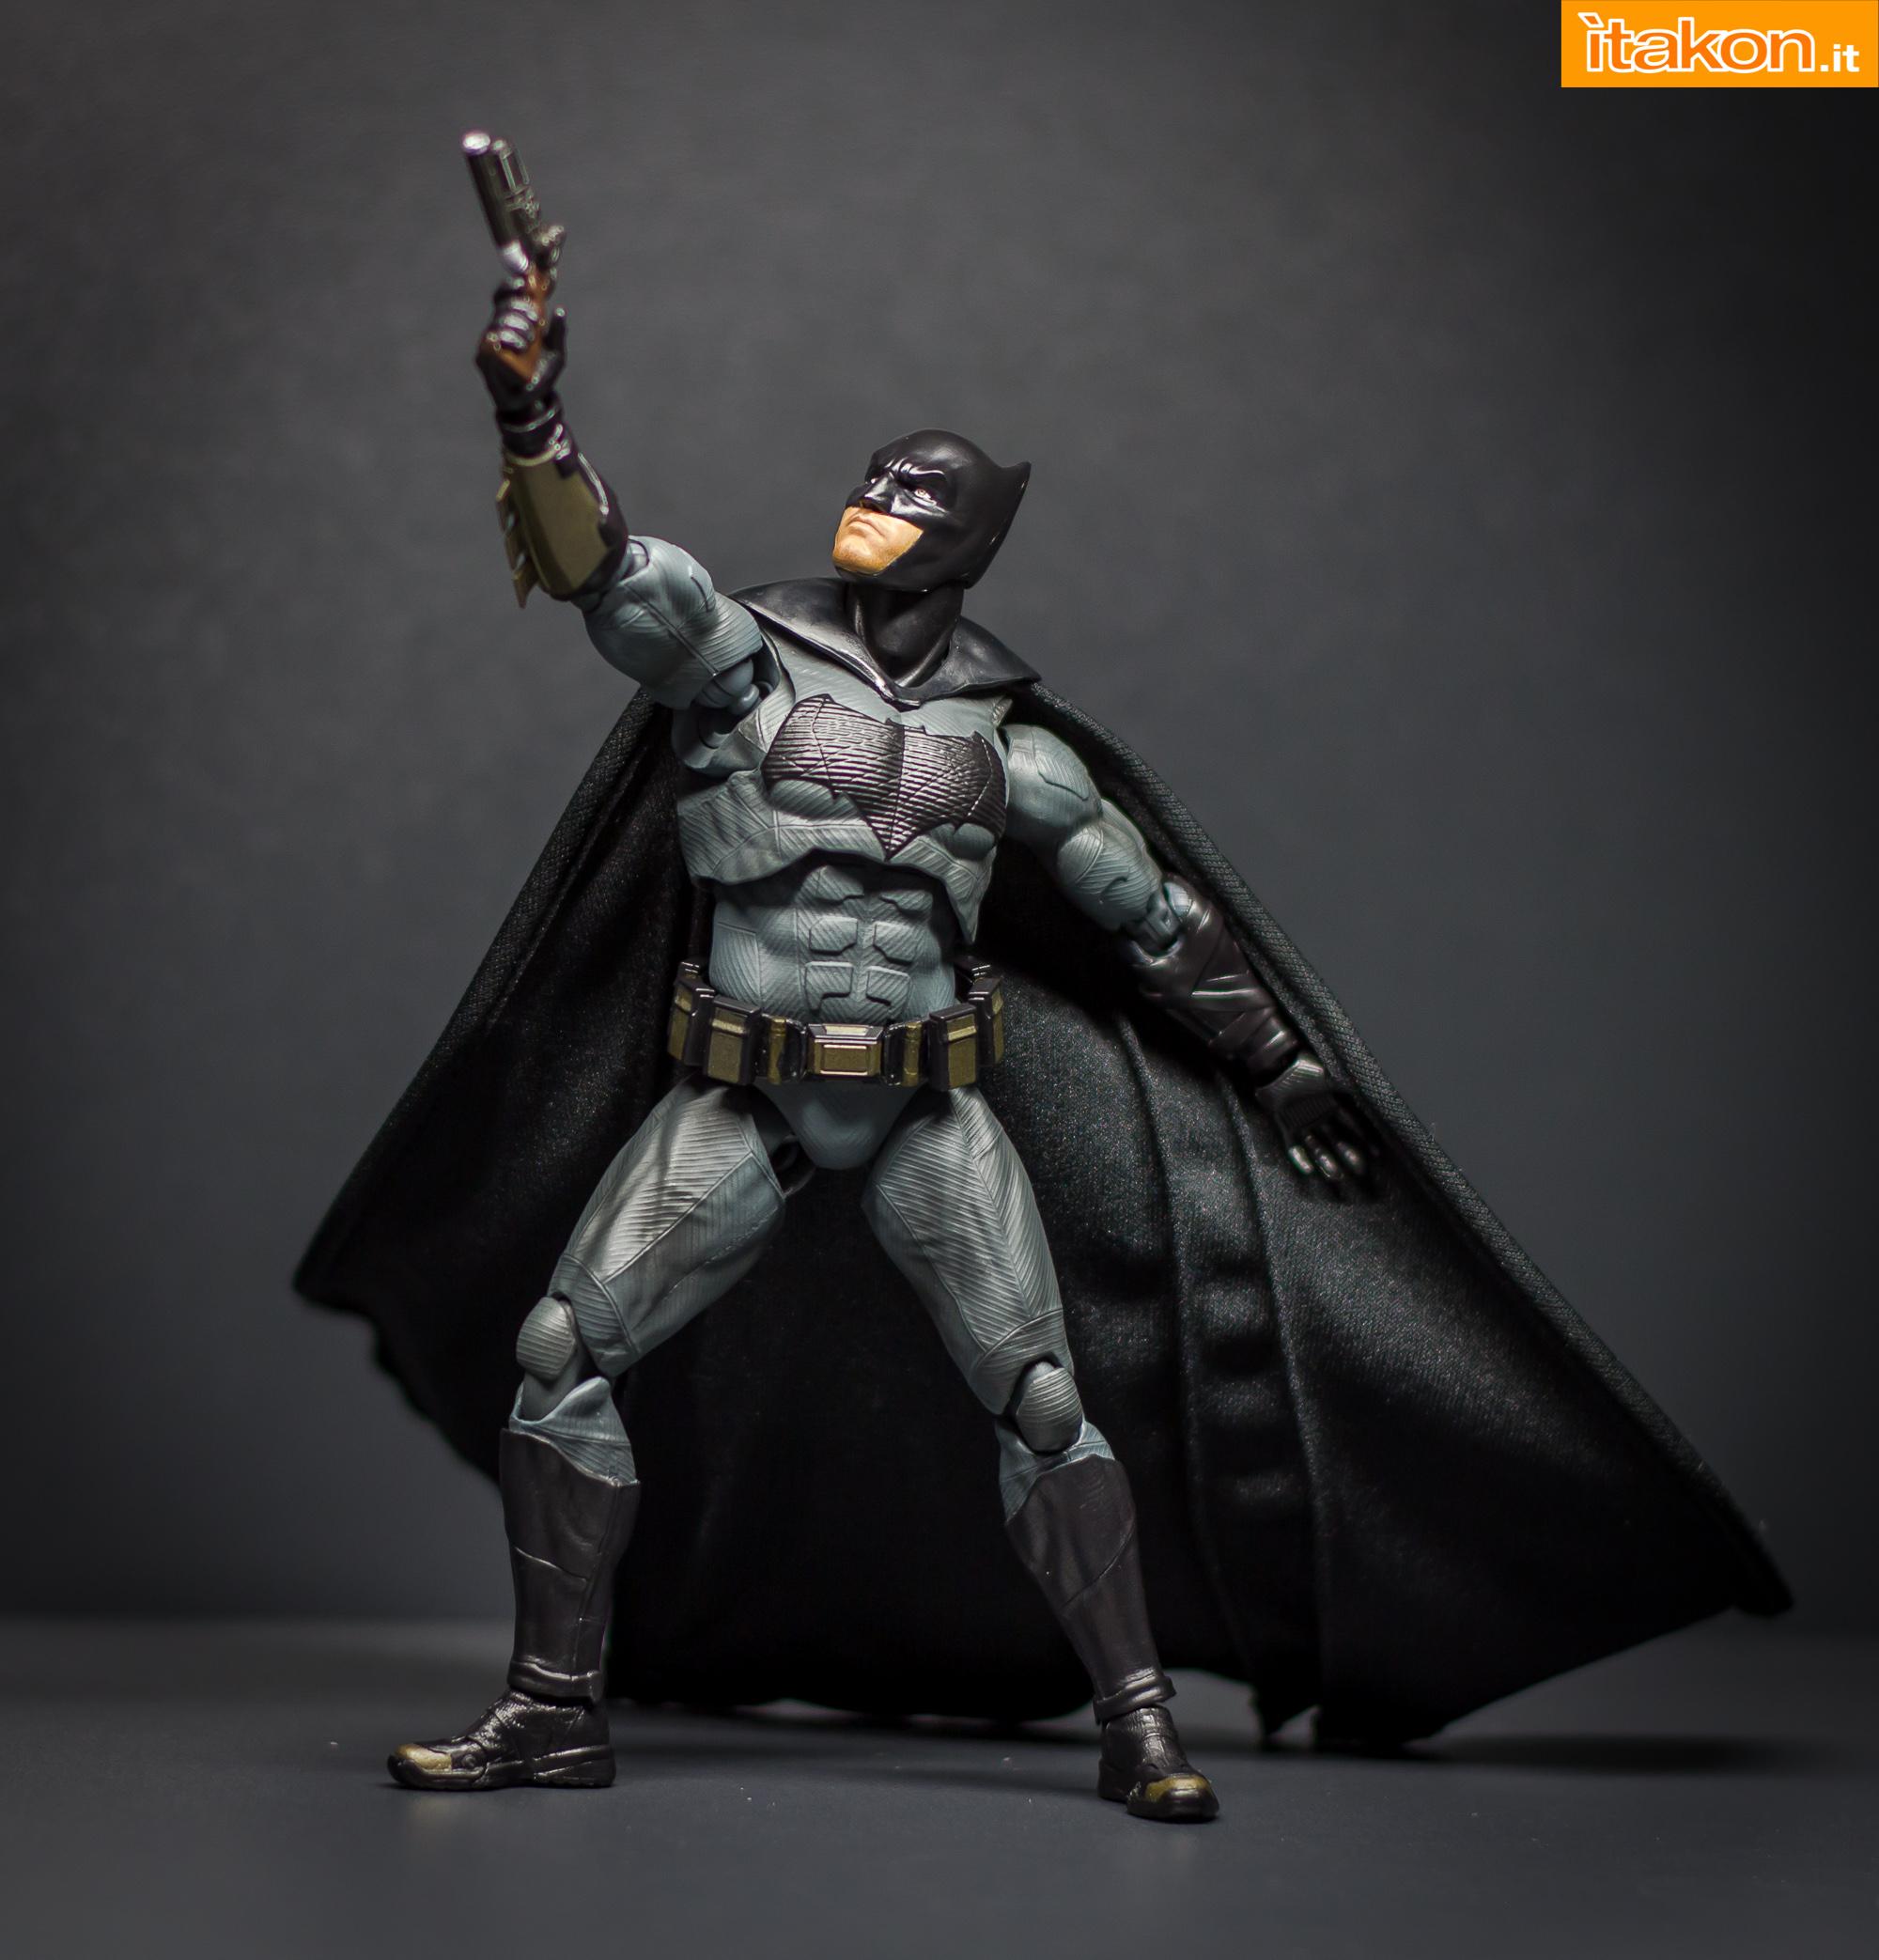 Link a Bandai S.H Figuarts Batman Justice League-42